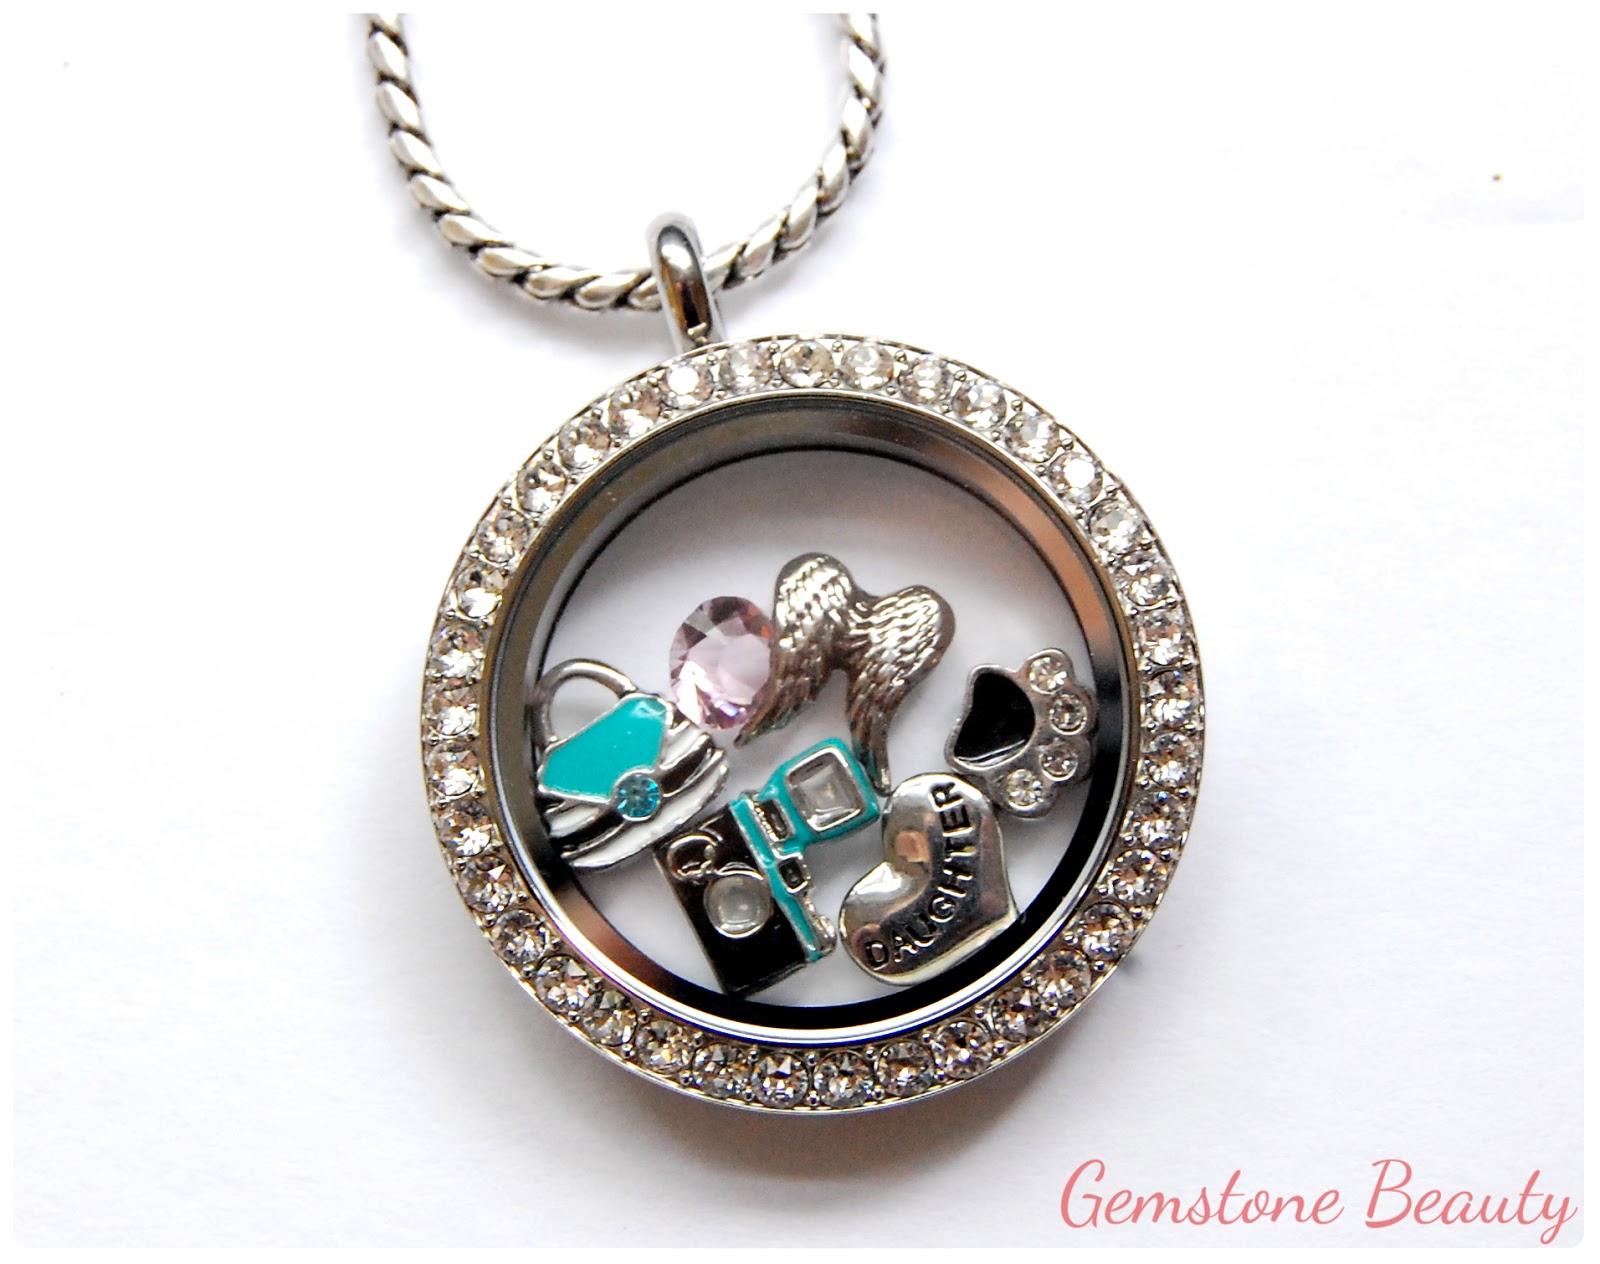 Gemstone Beauty: A Personal birthday gift: Origami Owl ... - photo#13